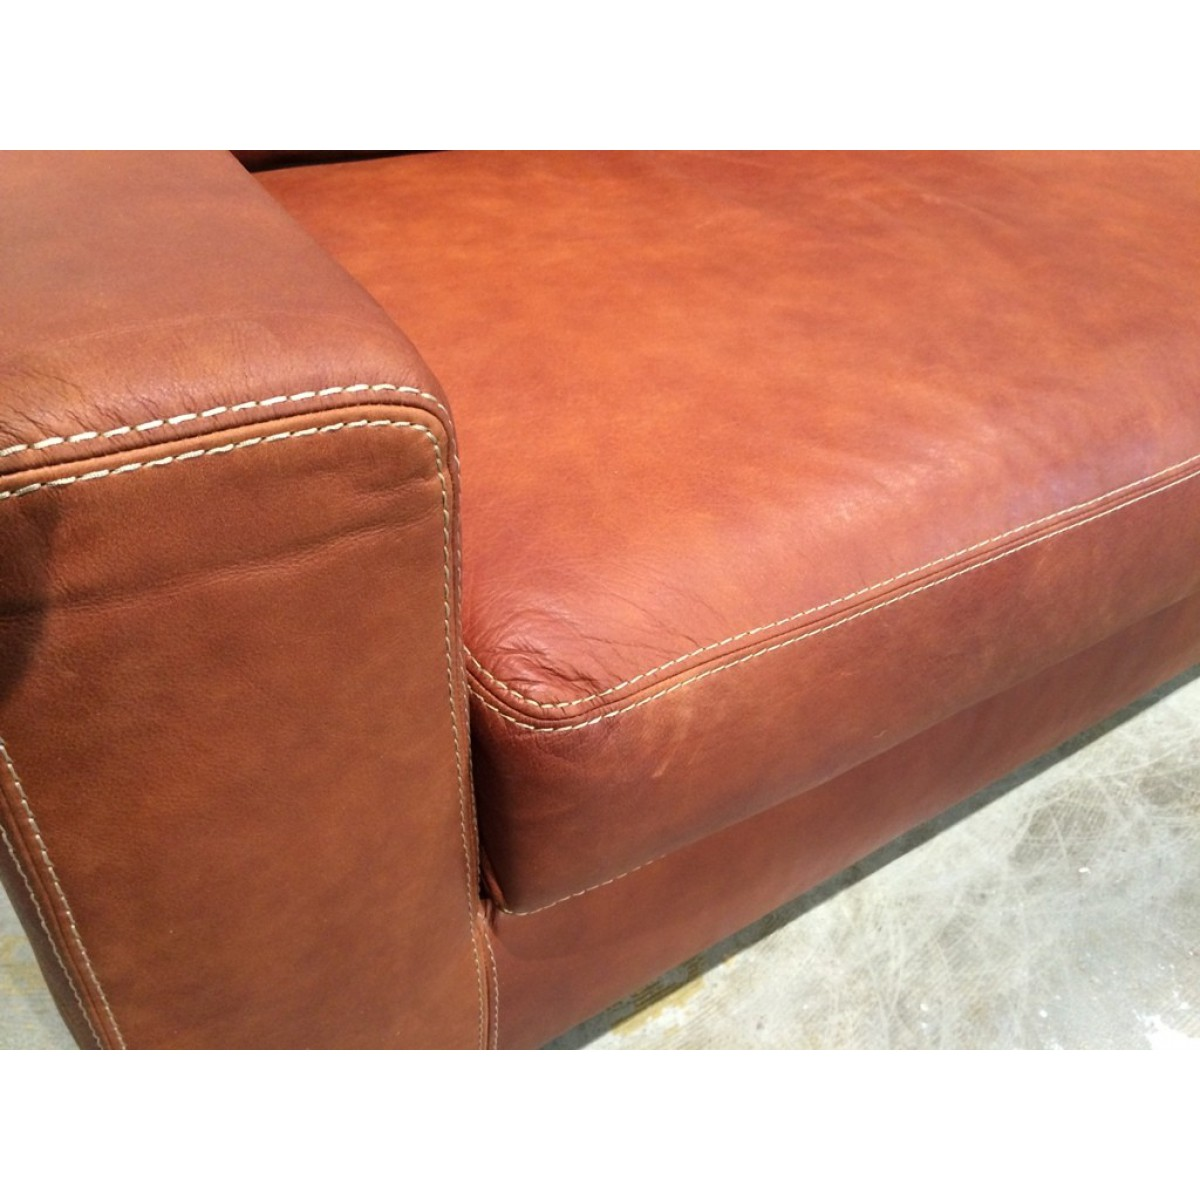 kentucky-leder-sofa-leer-bank-het-anker-shatterhand-stiknaad